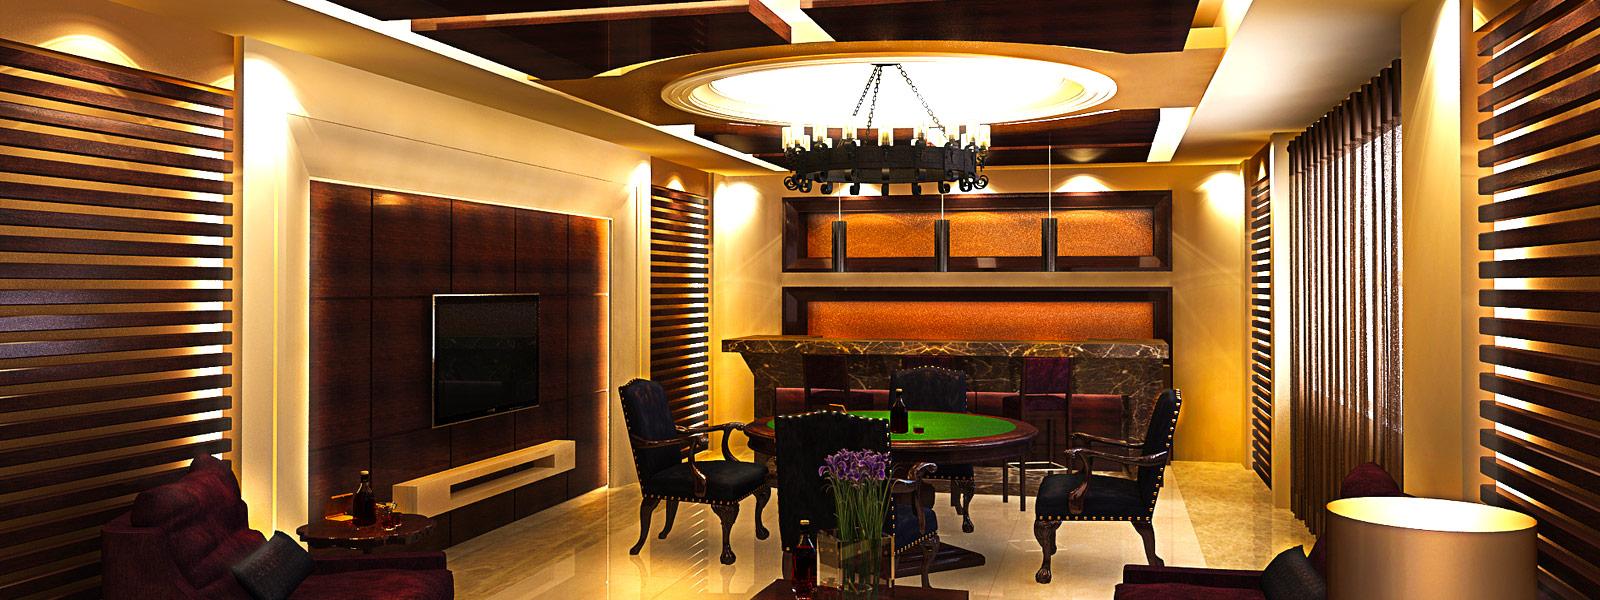 Magnificent Interior Landscape Designs Extensive Knowledge